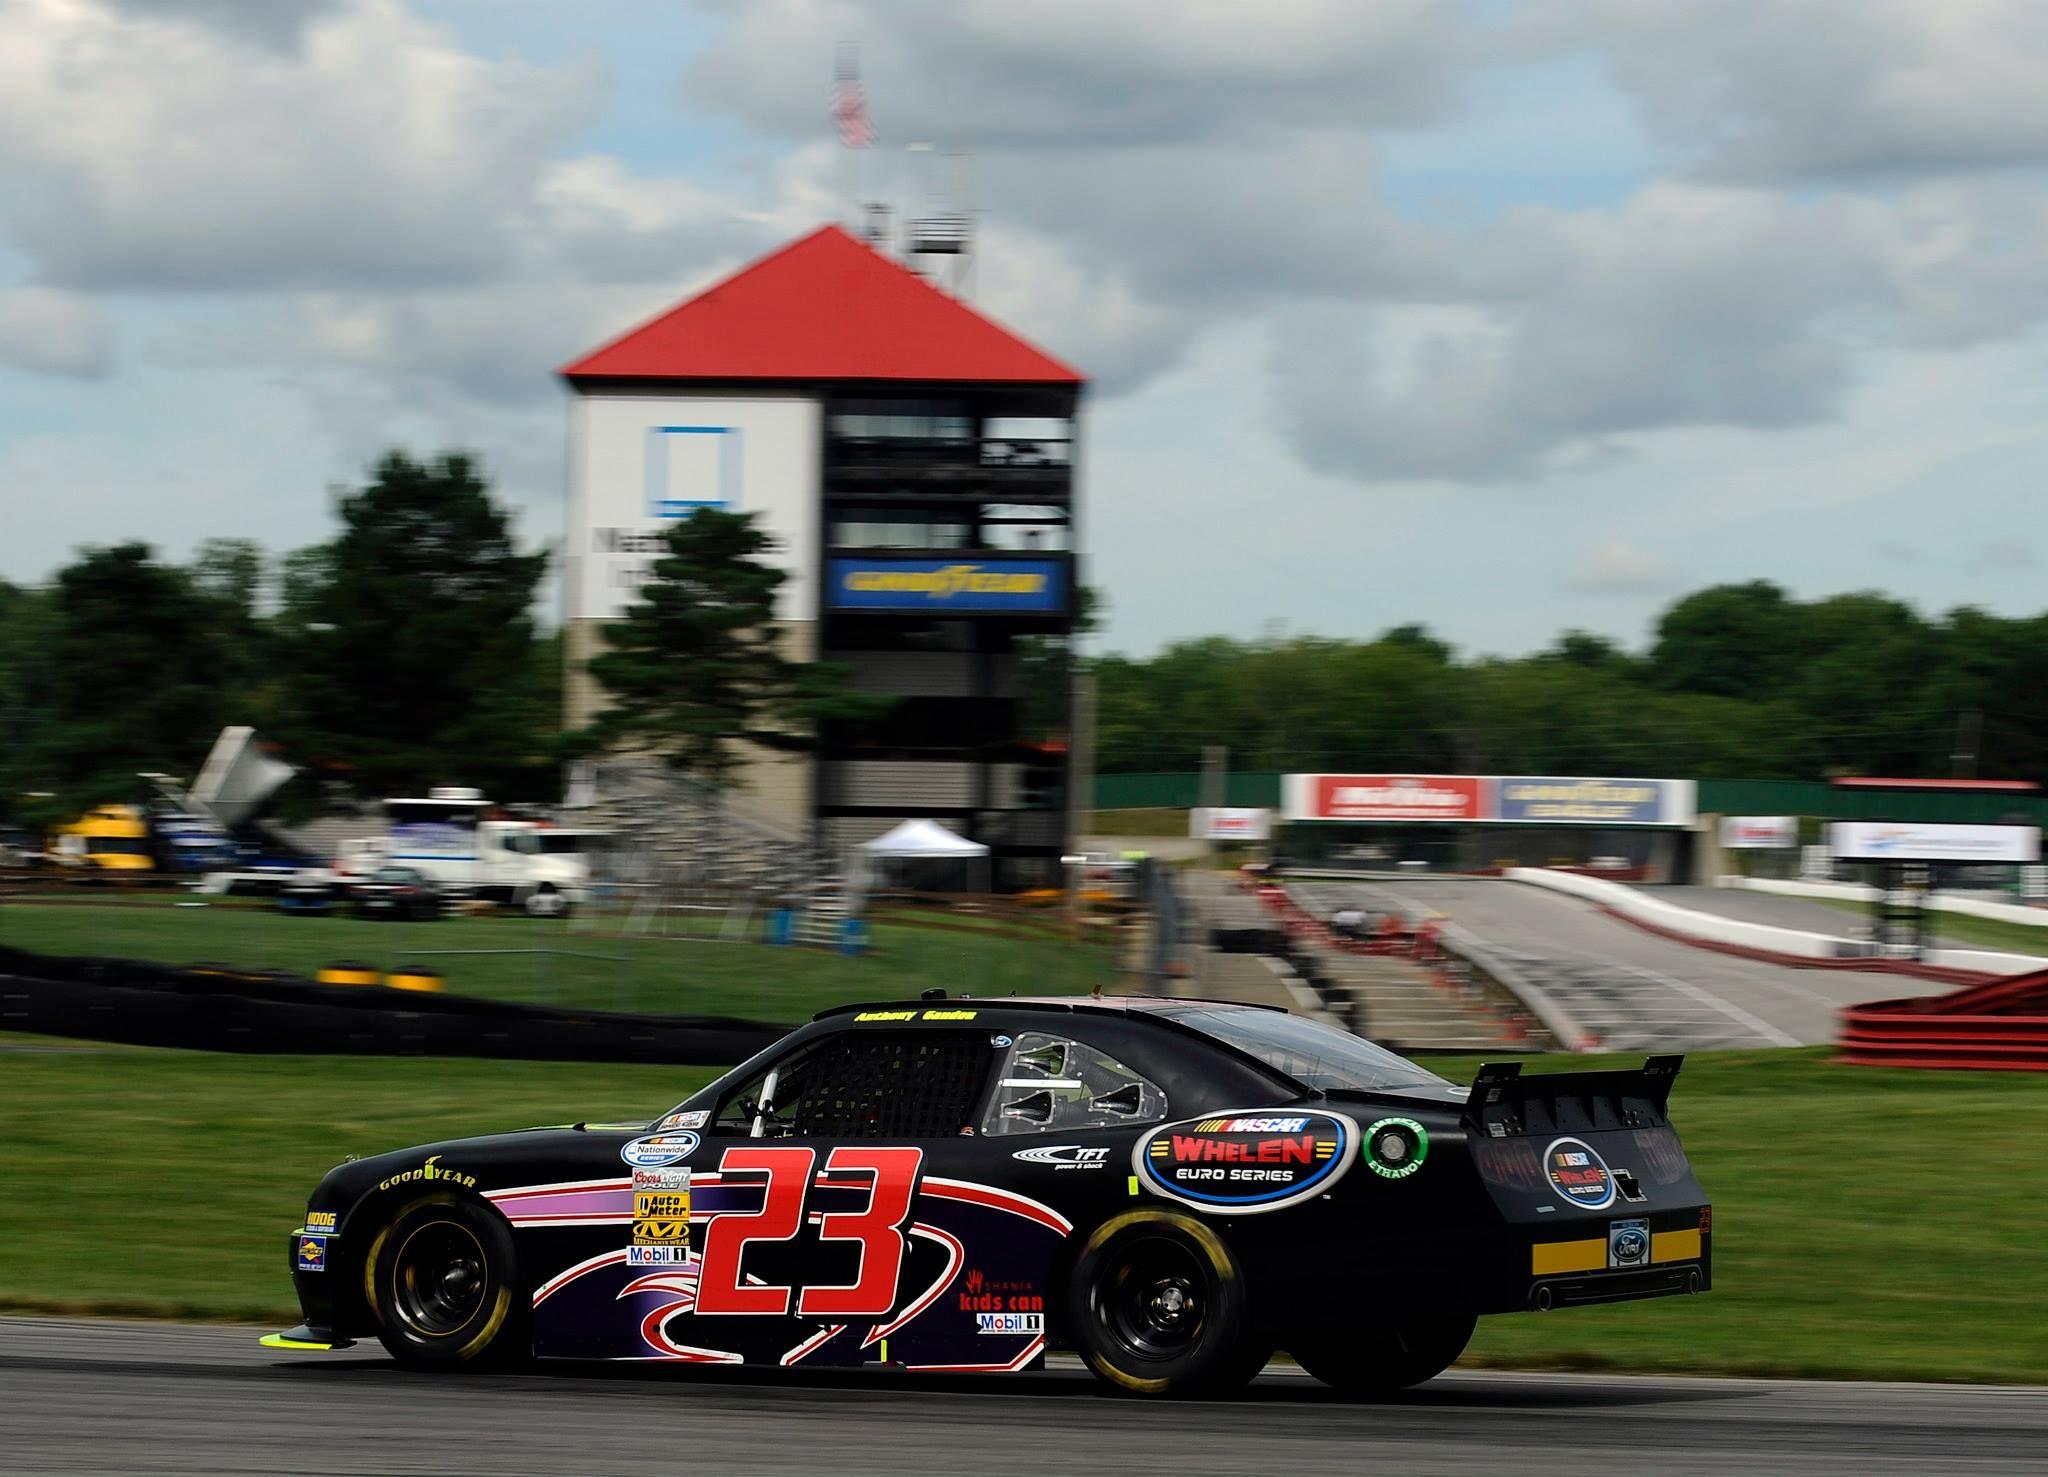 zweiter Teil des NASCAR-Abenteuers für EuroSeries-Piloten  #Gandon #Anto Gandon #Euro-Racecar-Series #Mid-Ohio #Mustang #NASCAR #NASCAR Whelen Euro Series #Nationwide #NNS #RickWare Racing #Whelen